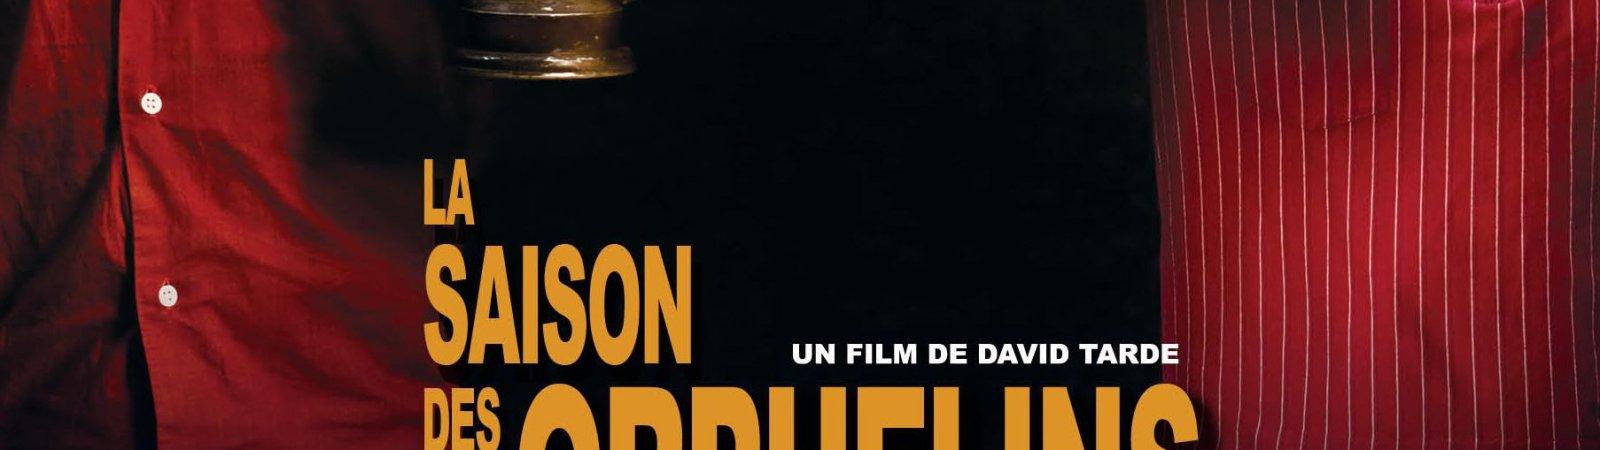 Photo dernier film David Tardé